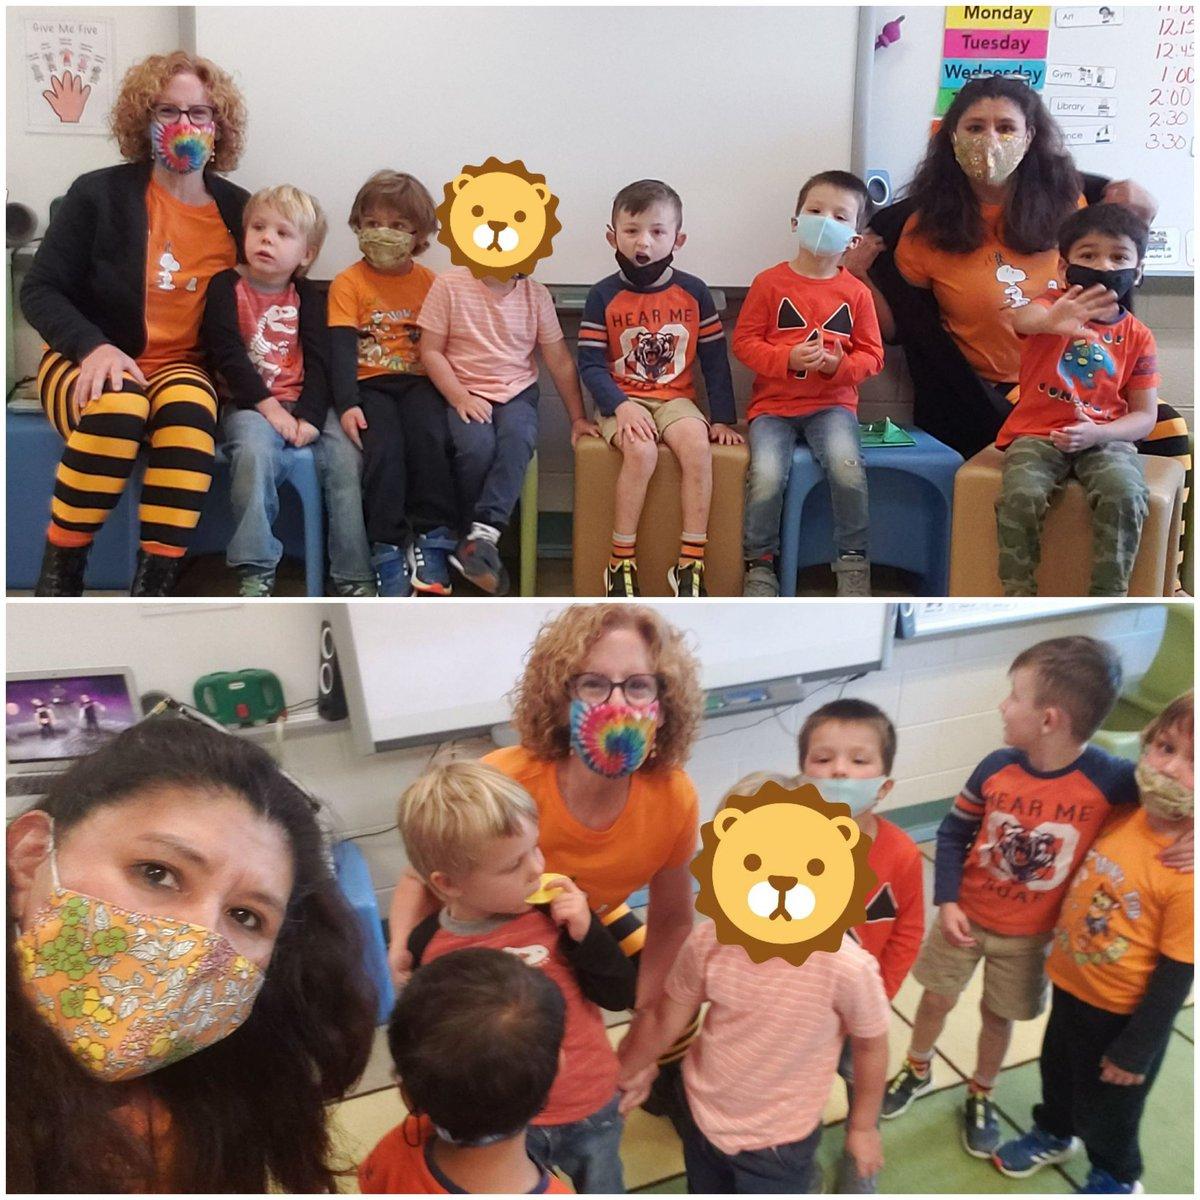 RT <a target='_blank' href='http://twitter.com/k_sliders'>@k_sliders</a>: Orange you glad preschoolers are antibullying. <a target='_blank' href='http://search.twitter.com/search?q=TuckahoeRocks'><a target='_blank' href='https://twitter.com/hashtag/TuckahoeRocks?src=hash'>#TuckahoeRocks</a></a> <a target='_blank' href='http://search.twitter.com/search?q=TuckahoeSchool'><a target='_blank' href='https://twitter.com/hashtag/TuckahoeSchool?src=hash'>#TuckahoeSchool</a></a> <a target='_blank' href='http://twitter.com/TuckPrinc'>@TuckPrinc</a> <a target='_blank' href='http://twitter.com/BirotteJody'>@BirotteJody</a> <a target='_blank' href='https://t.co/6R4AlFT6ed'>https://t.co/6R4AlFT6ed</a>